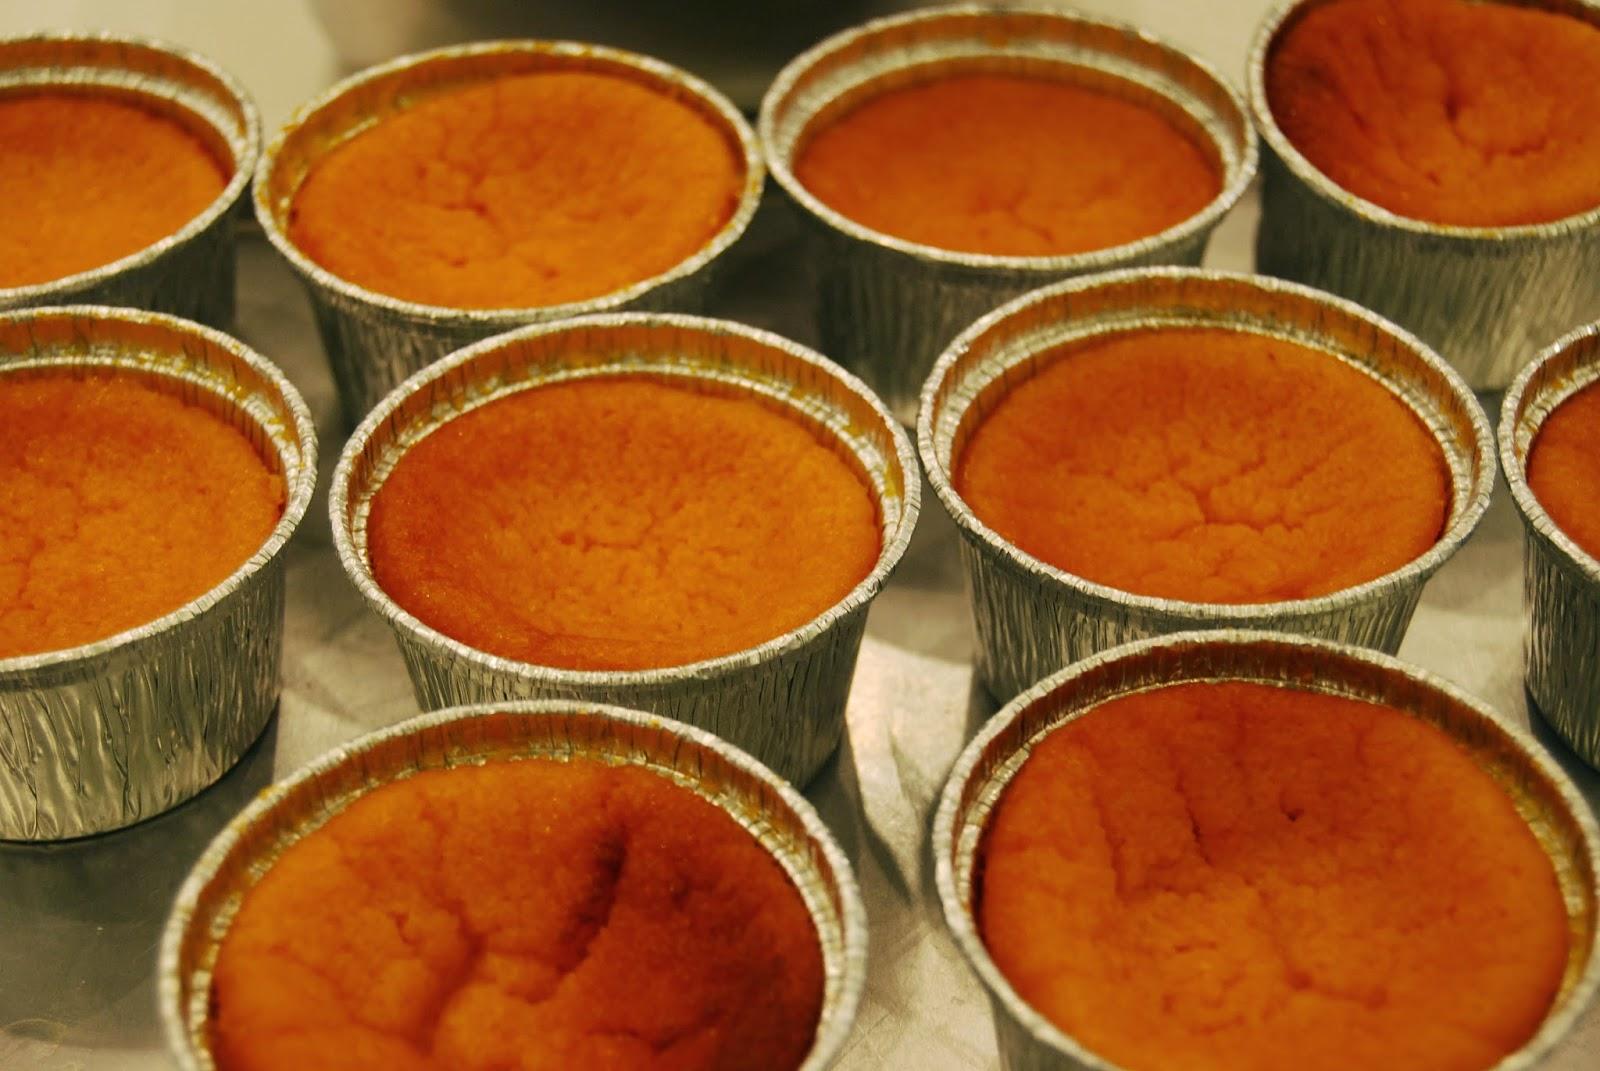 http://sosunnyblog.blogspot.com.es/2014/10/pastel-de-calabaza-con-ensalada-de.html